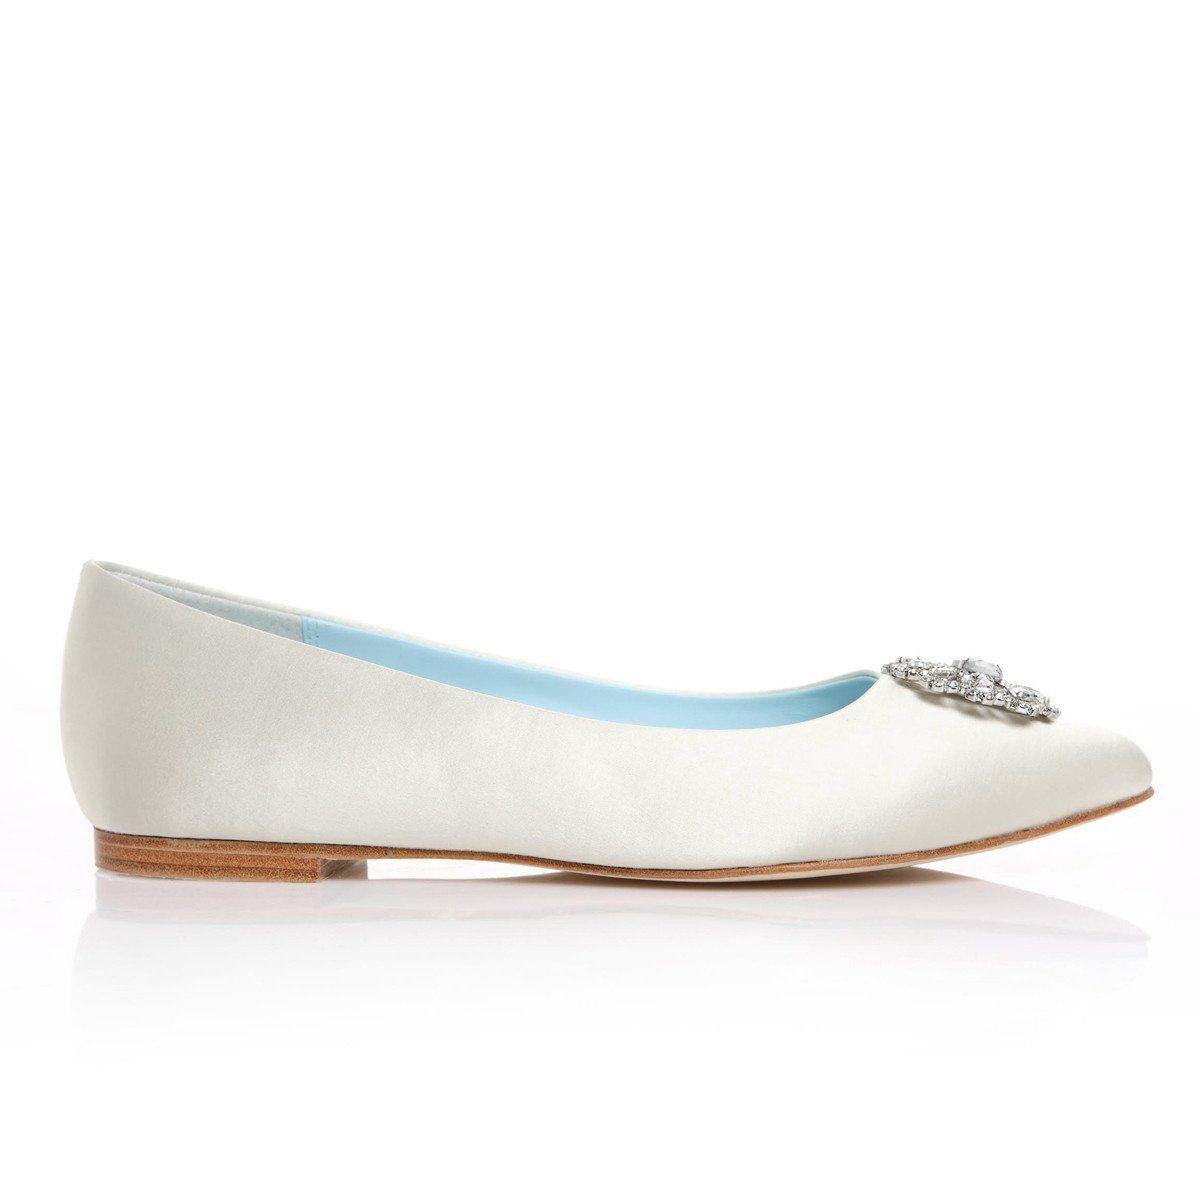 Crystal White Wedding Flats Wedding Flats Wedding Shoes Crystals